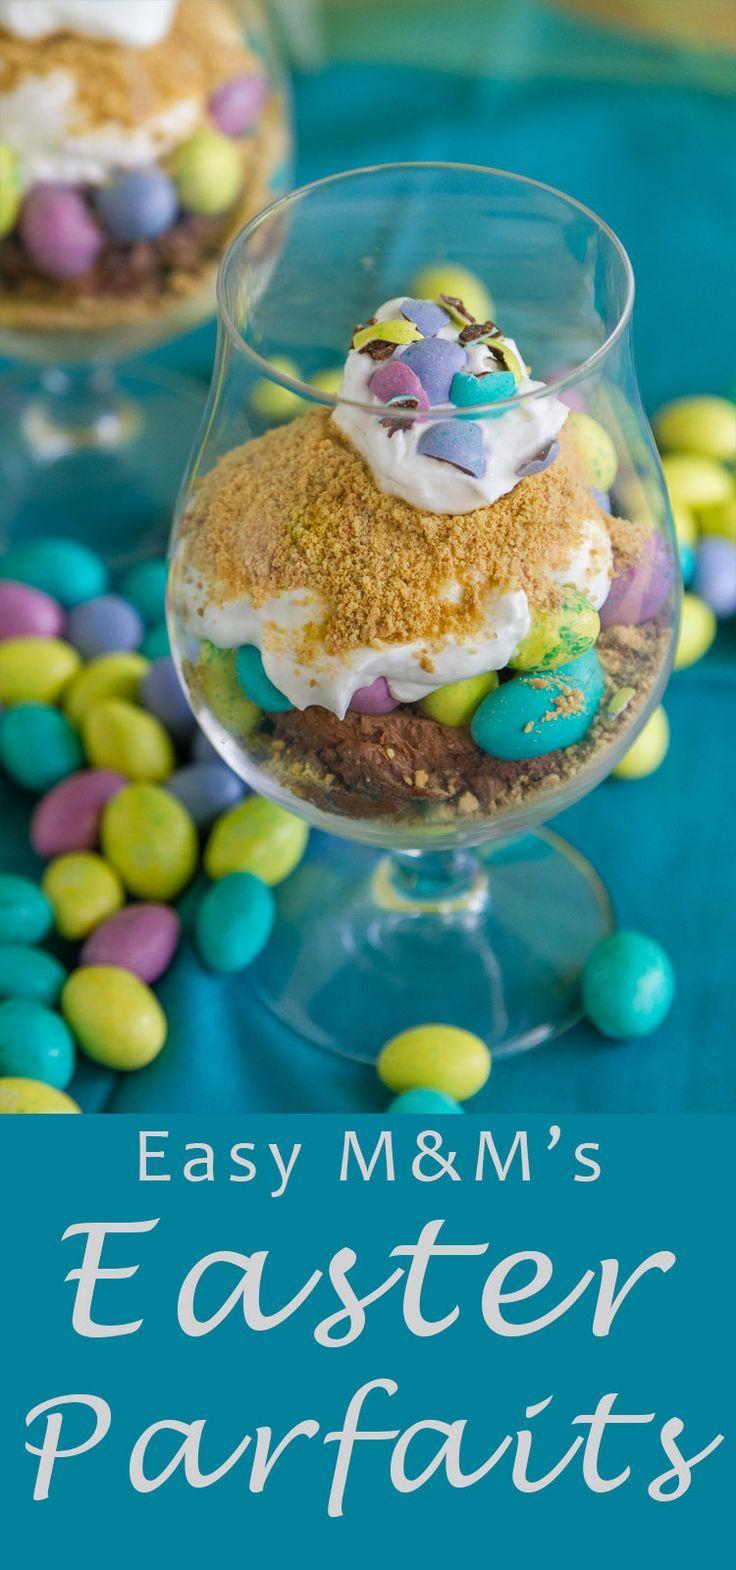 Easy M&Ms®️️ Easter Individual Parfaits - fun & delicious! #sponsored #ad @mmschocolate, @DoveChocolateUS